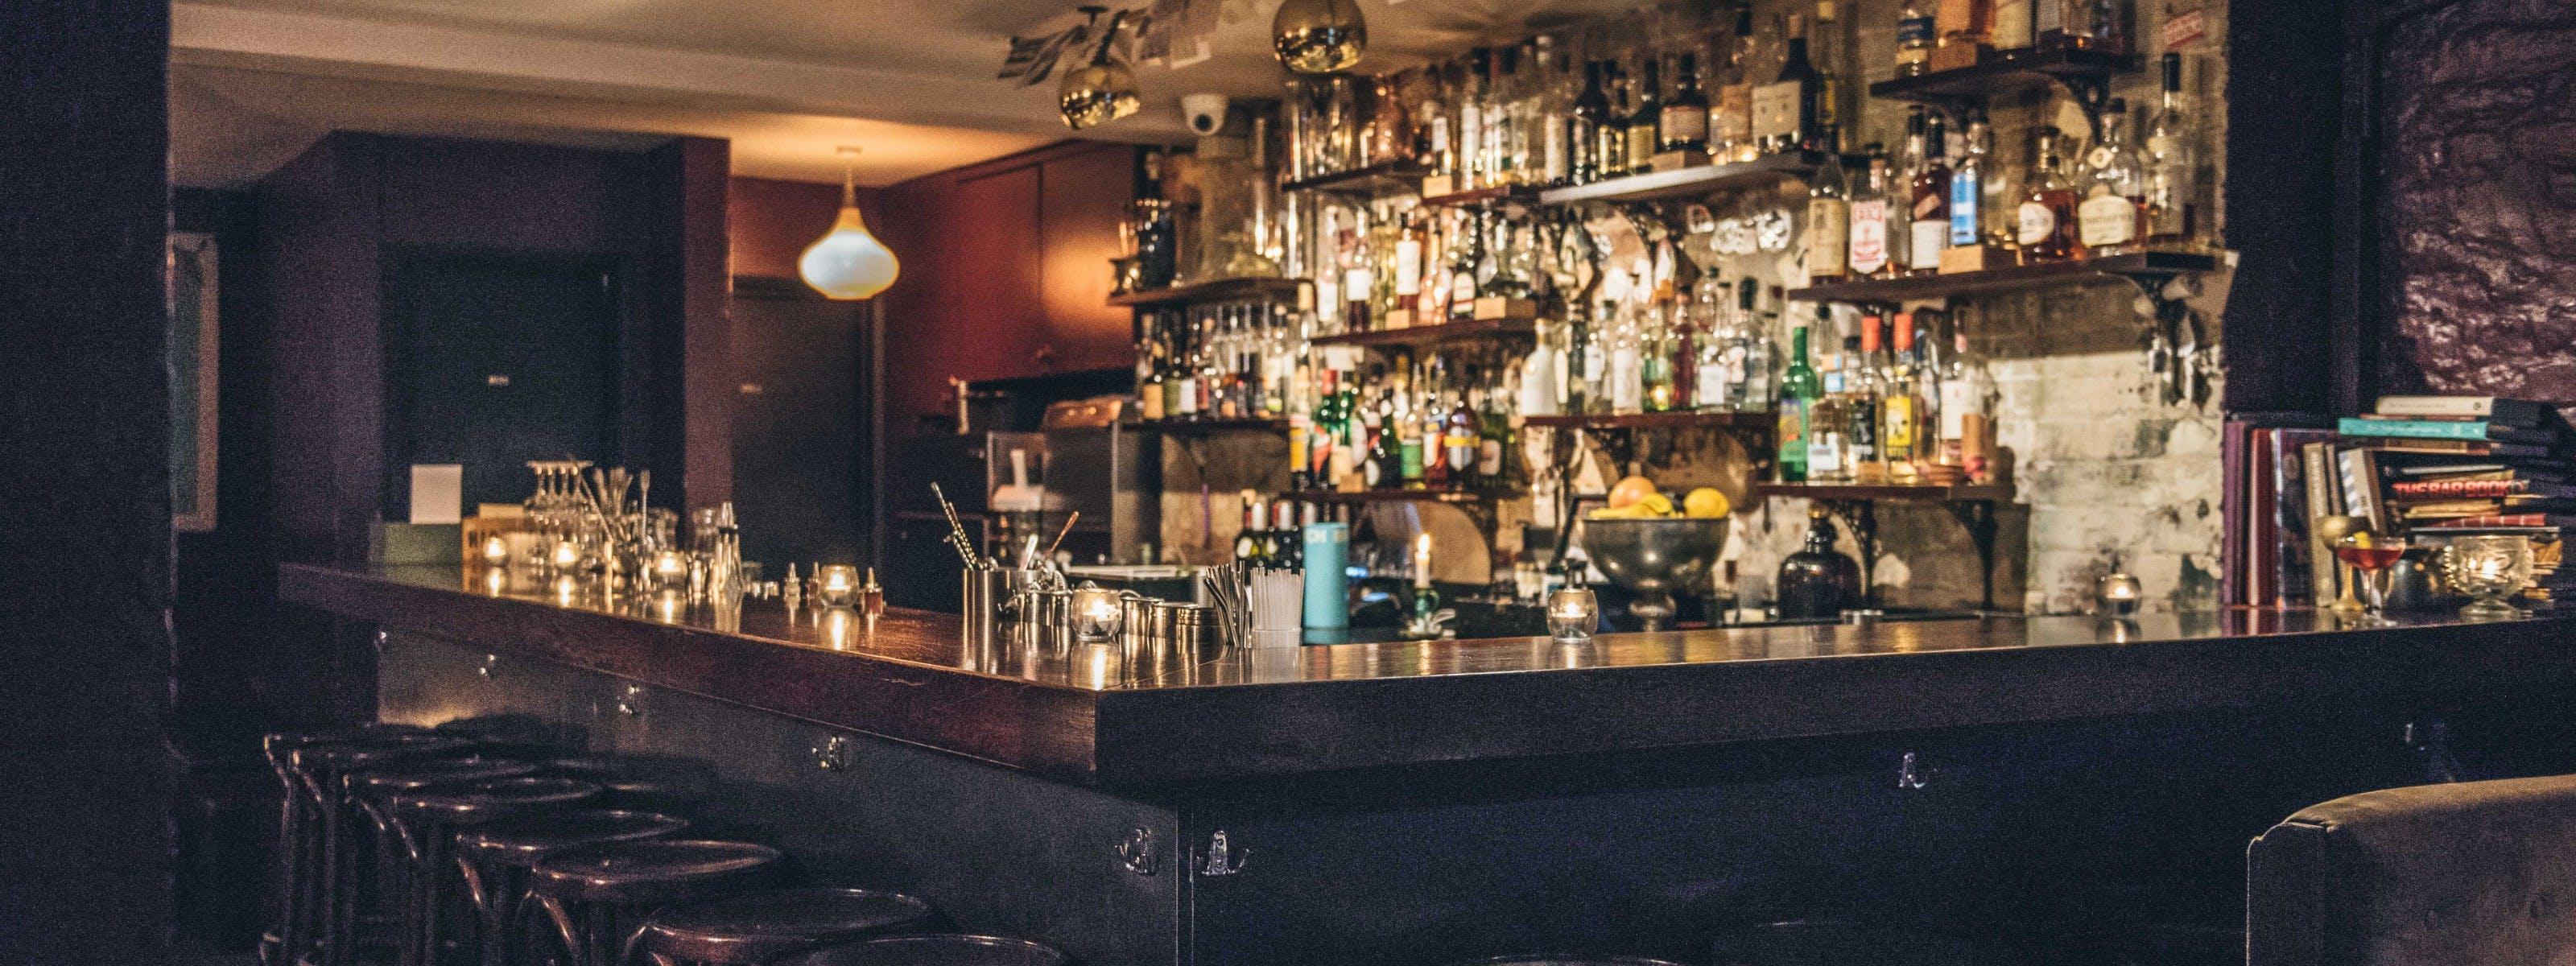 dating bars în londra